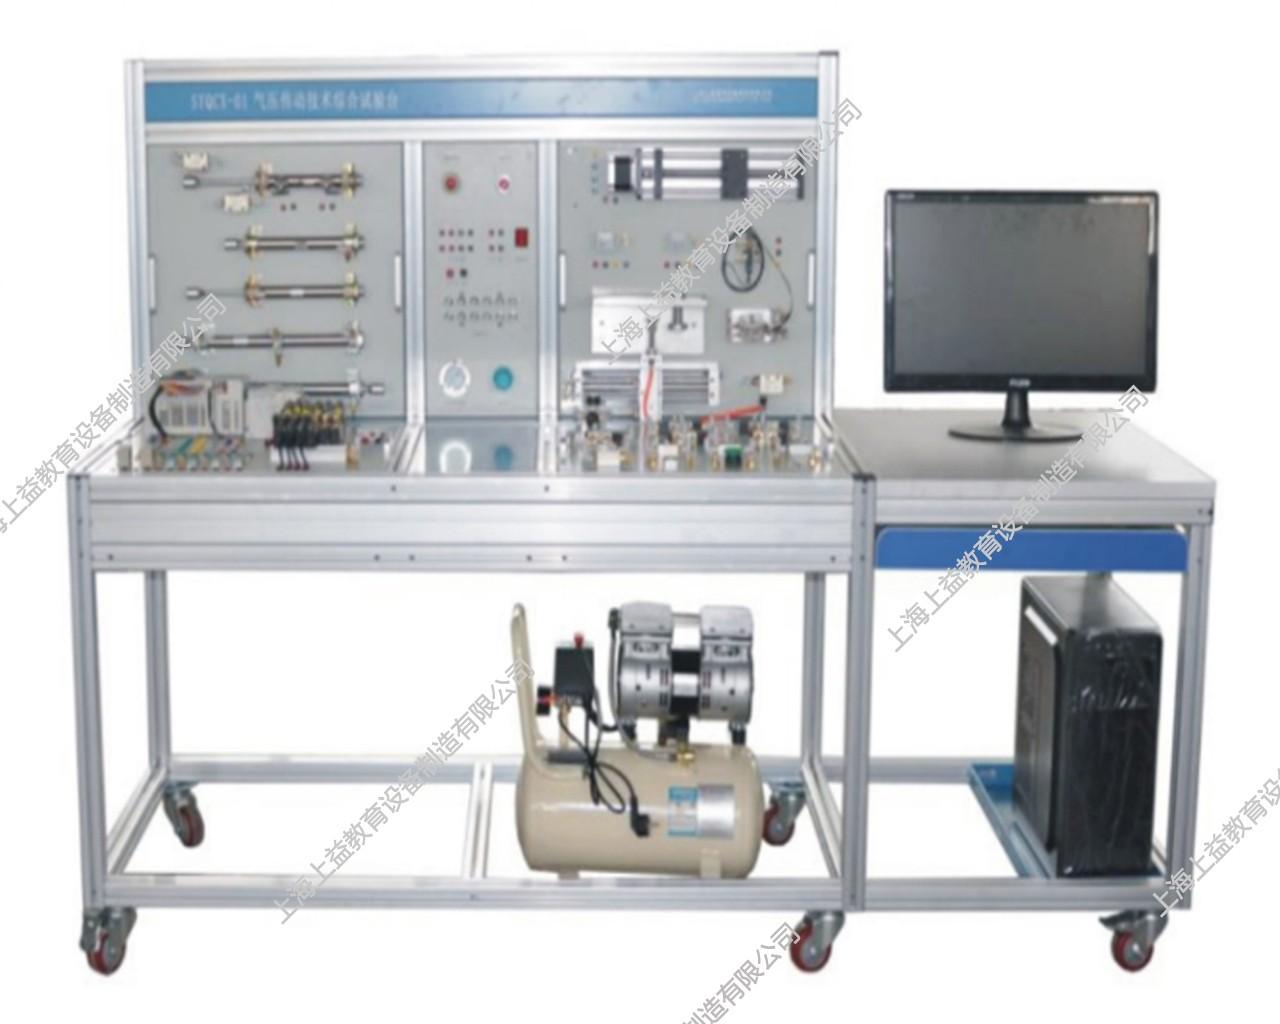 SYQPL-16创新型气动控制技术wwwlehu8vip装置